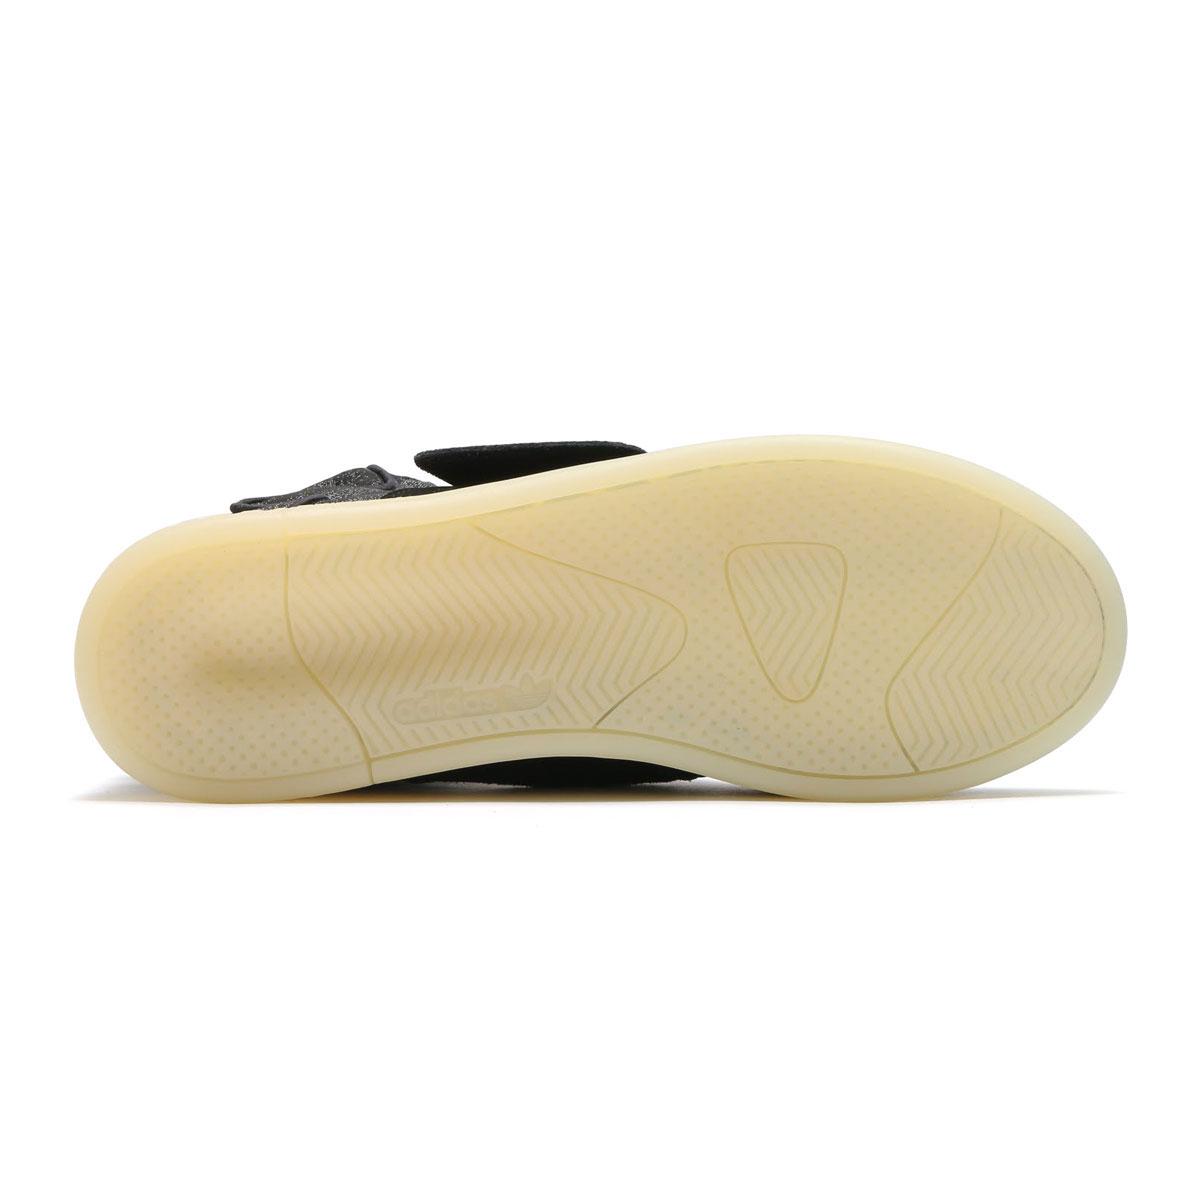 adidas Originals TUBULAR INVADER STRAP JC(adidasuorijinarusuchuburaimbeidasutorappu JC)(Core Black/Core Black/Crystal White)17SS-I